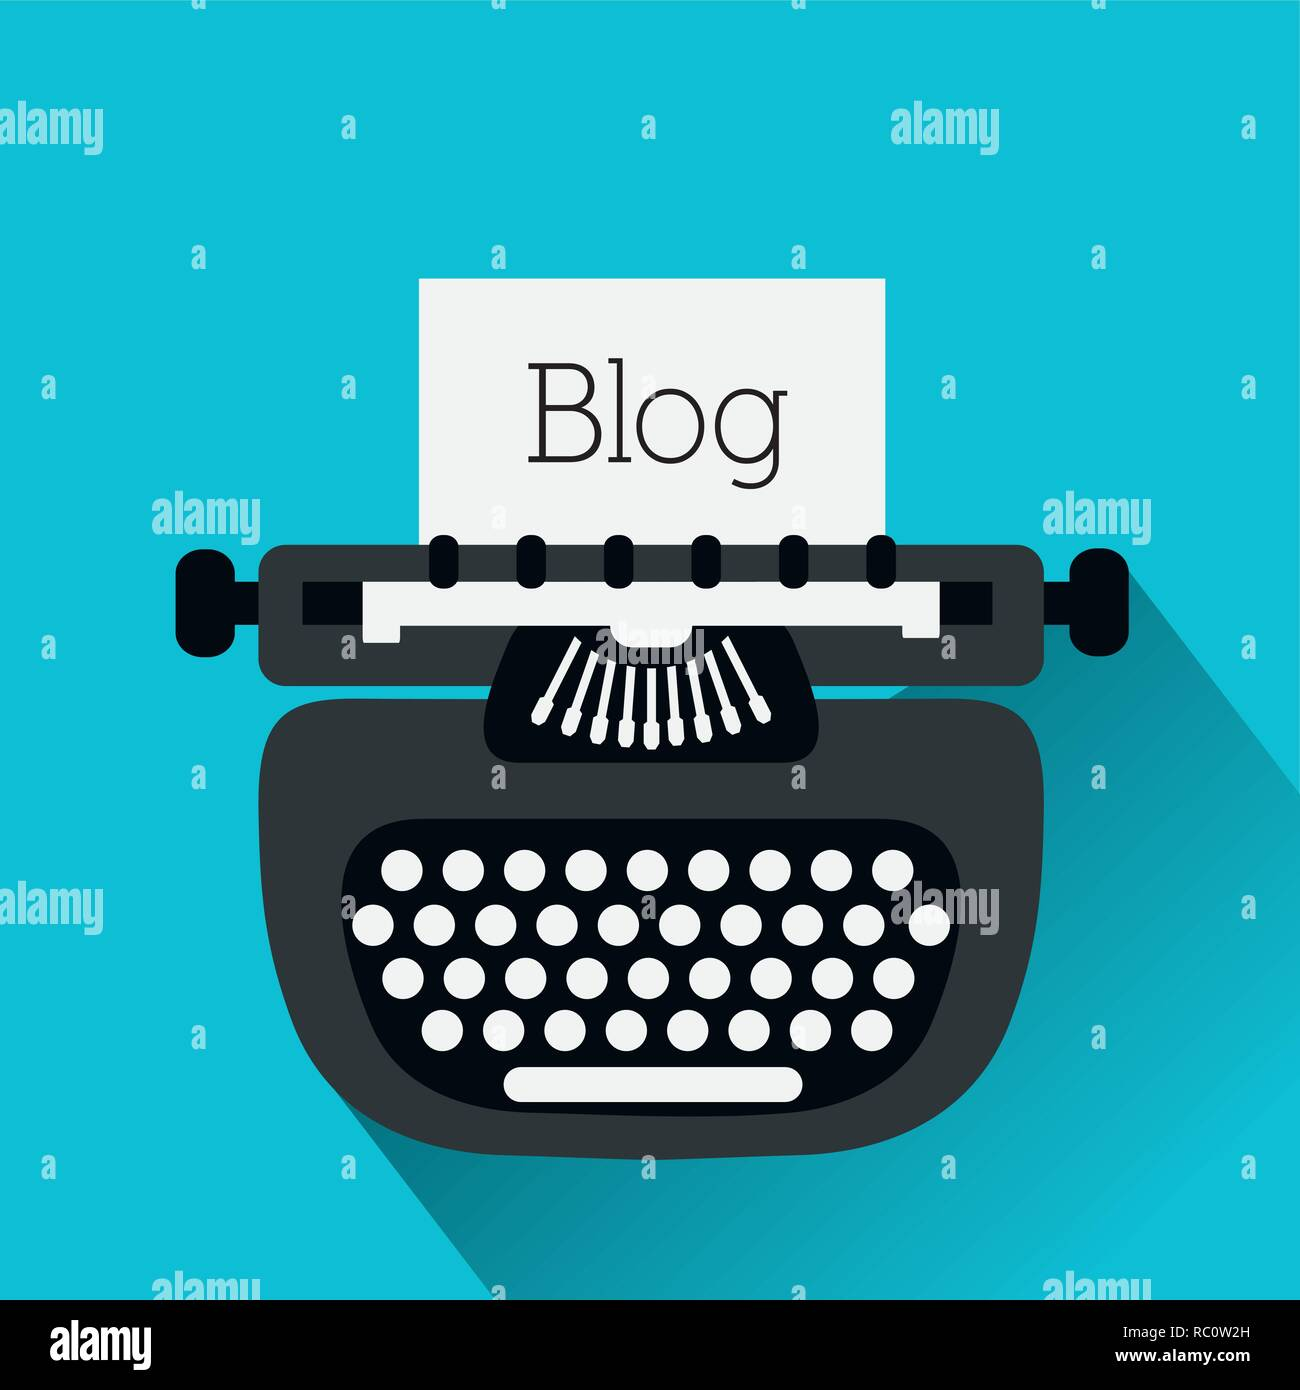 Blog design icons - Stock Image